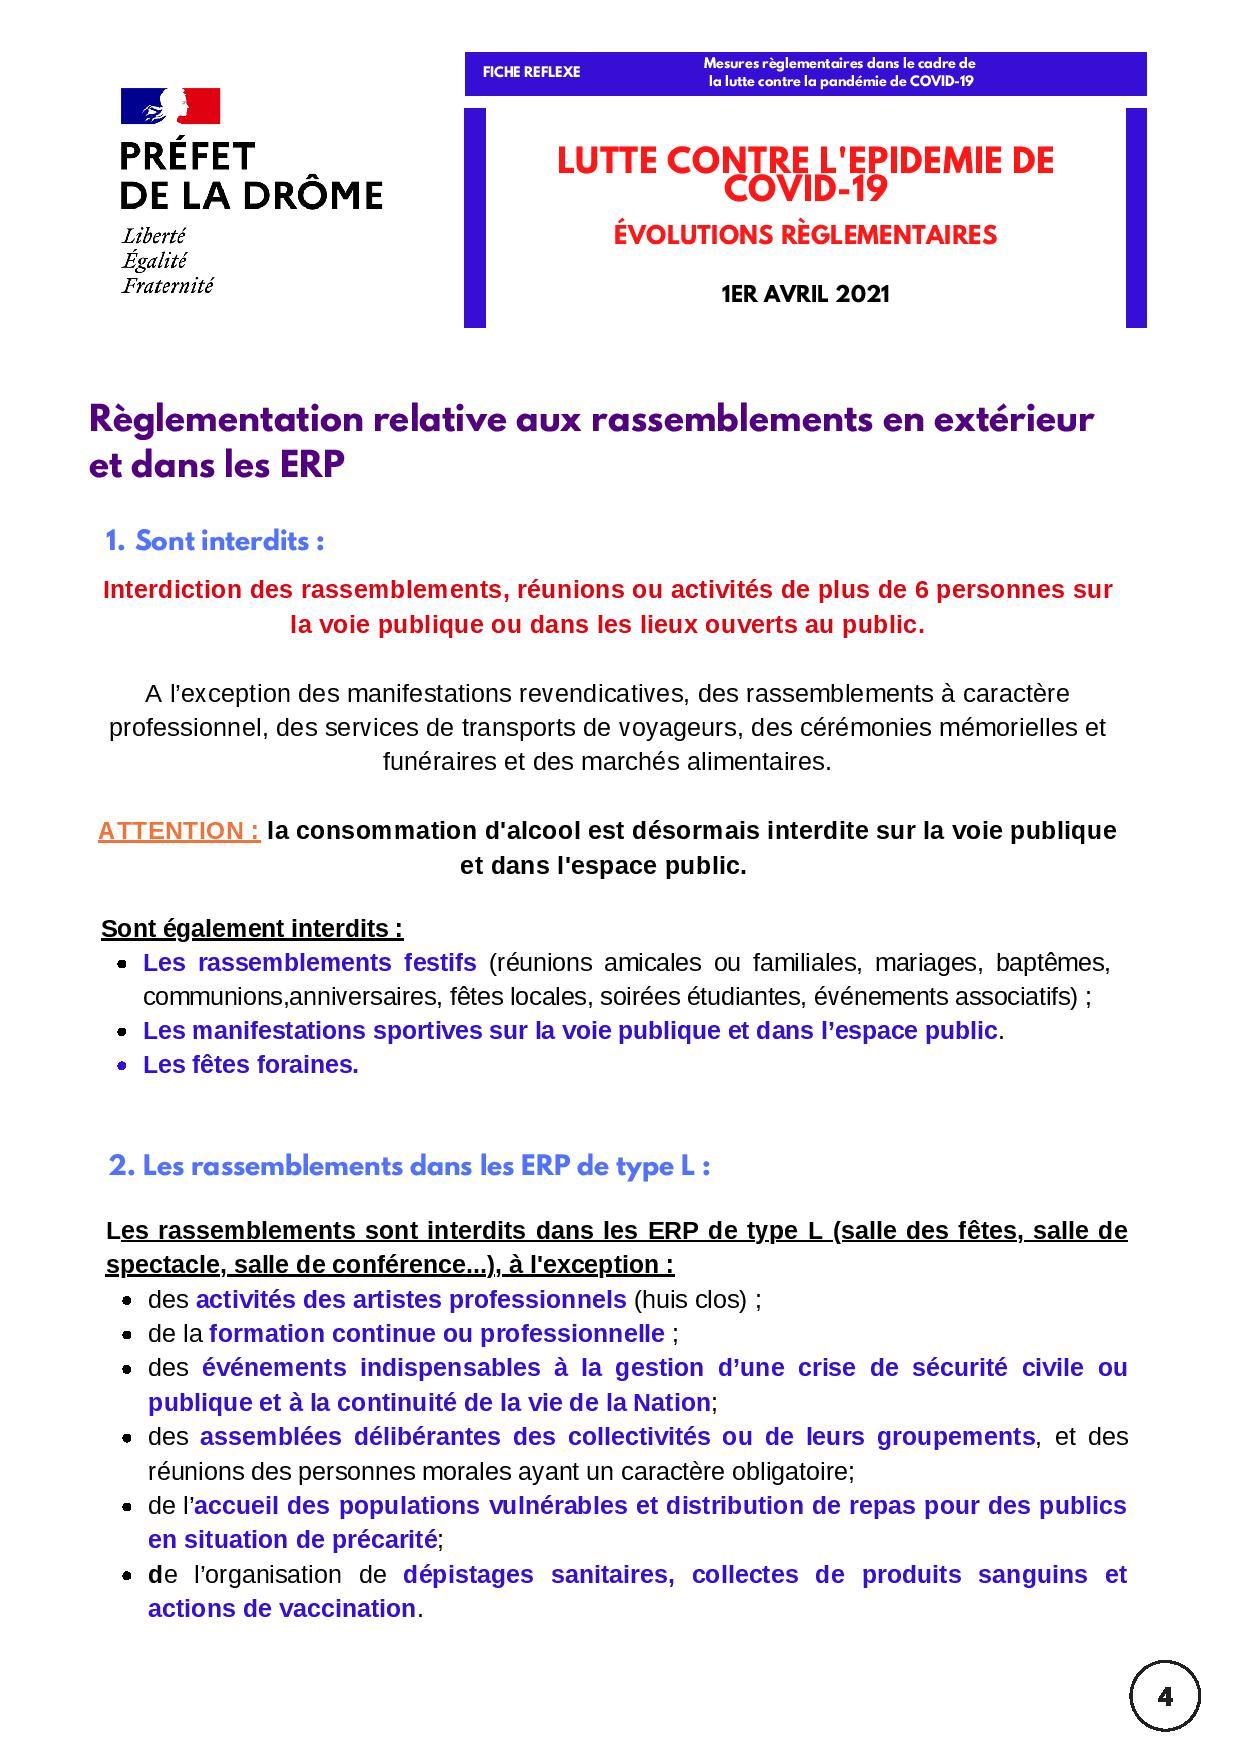 Fiche réflexe du 1er avril 2021-1-page-004.jpg